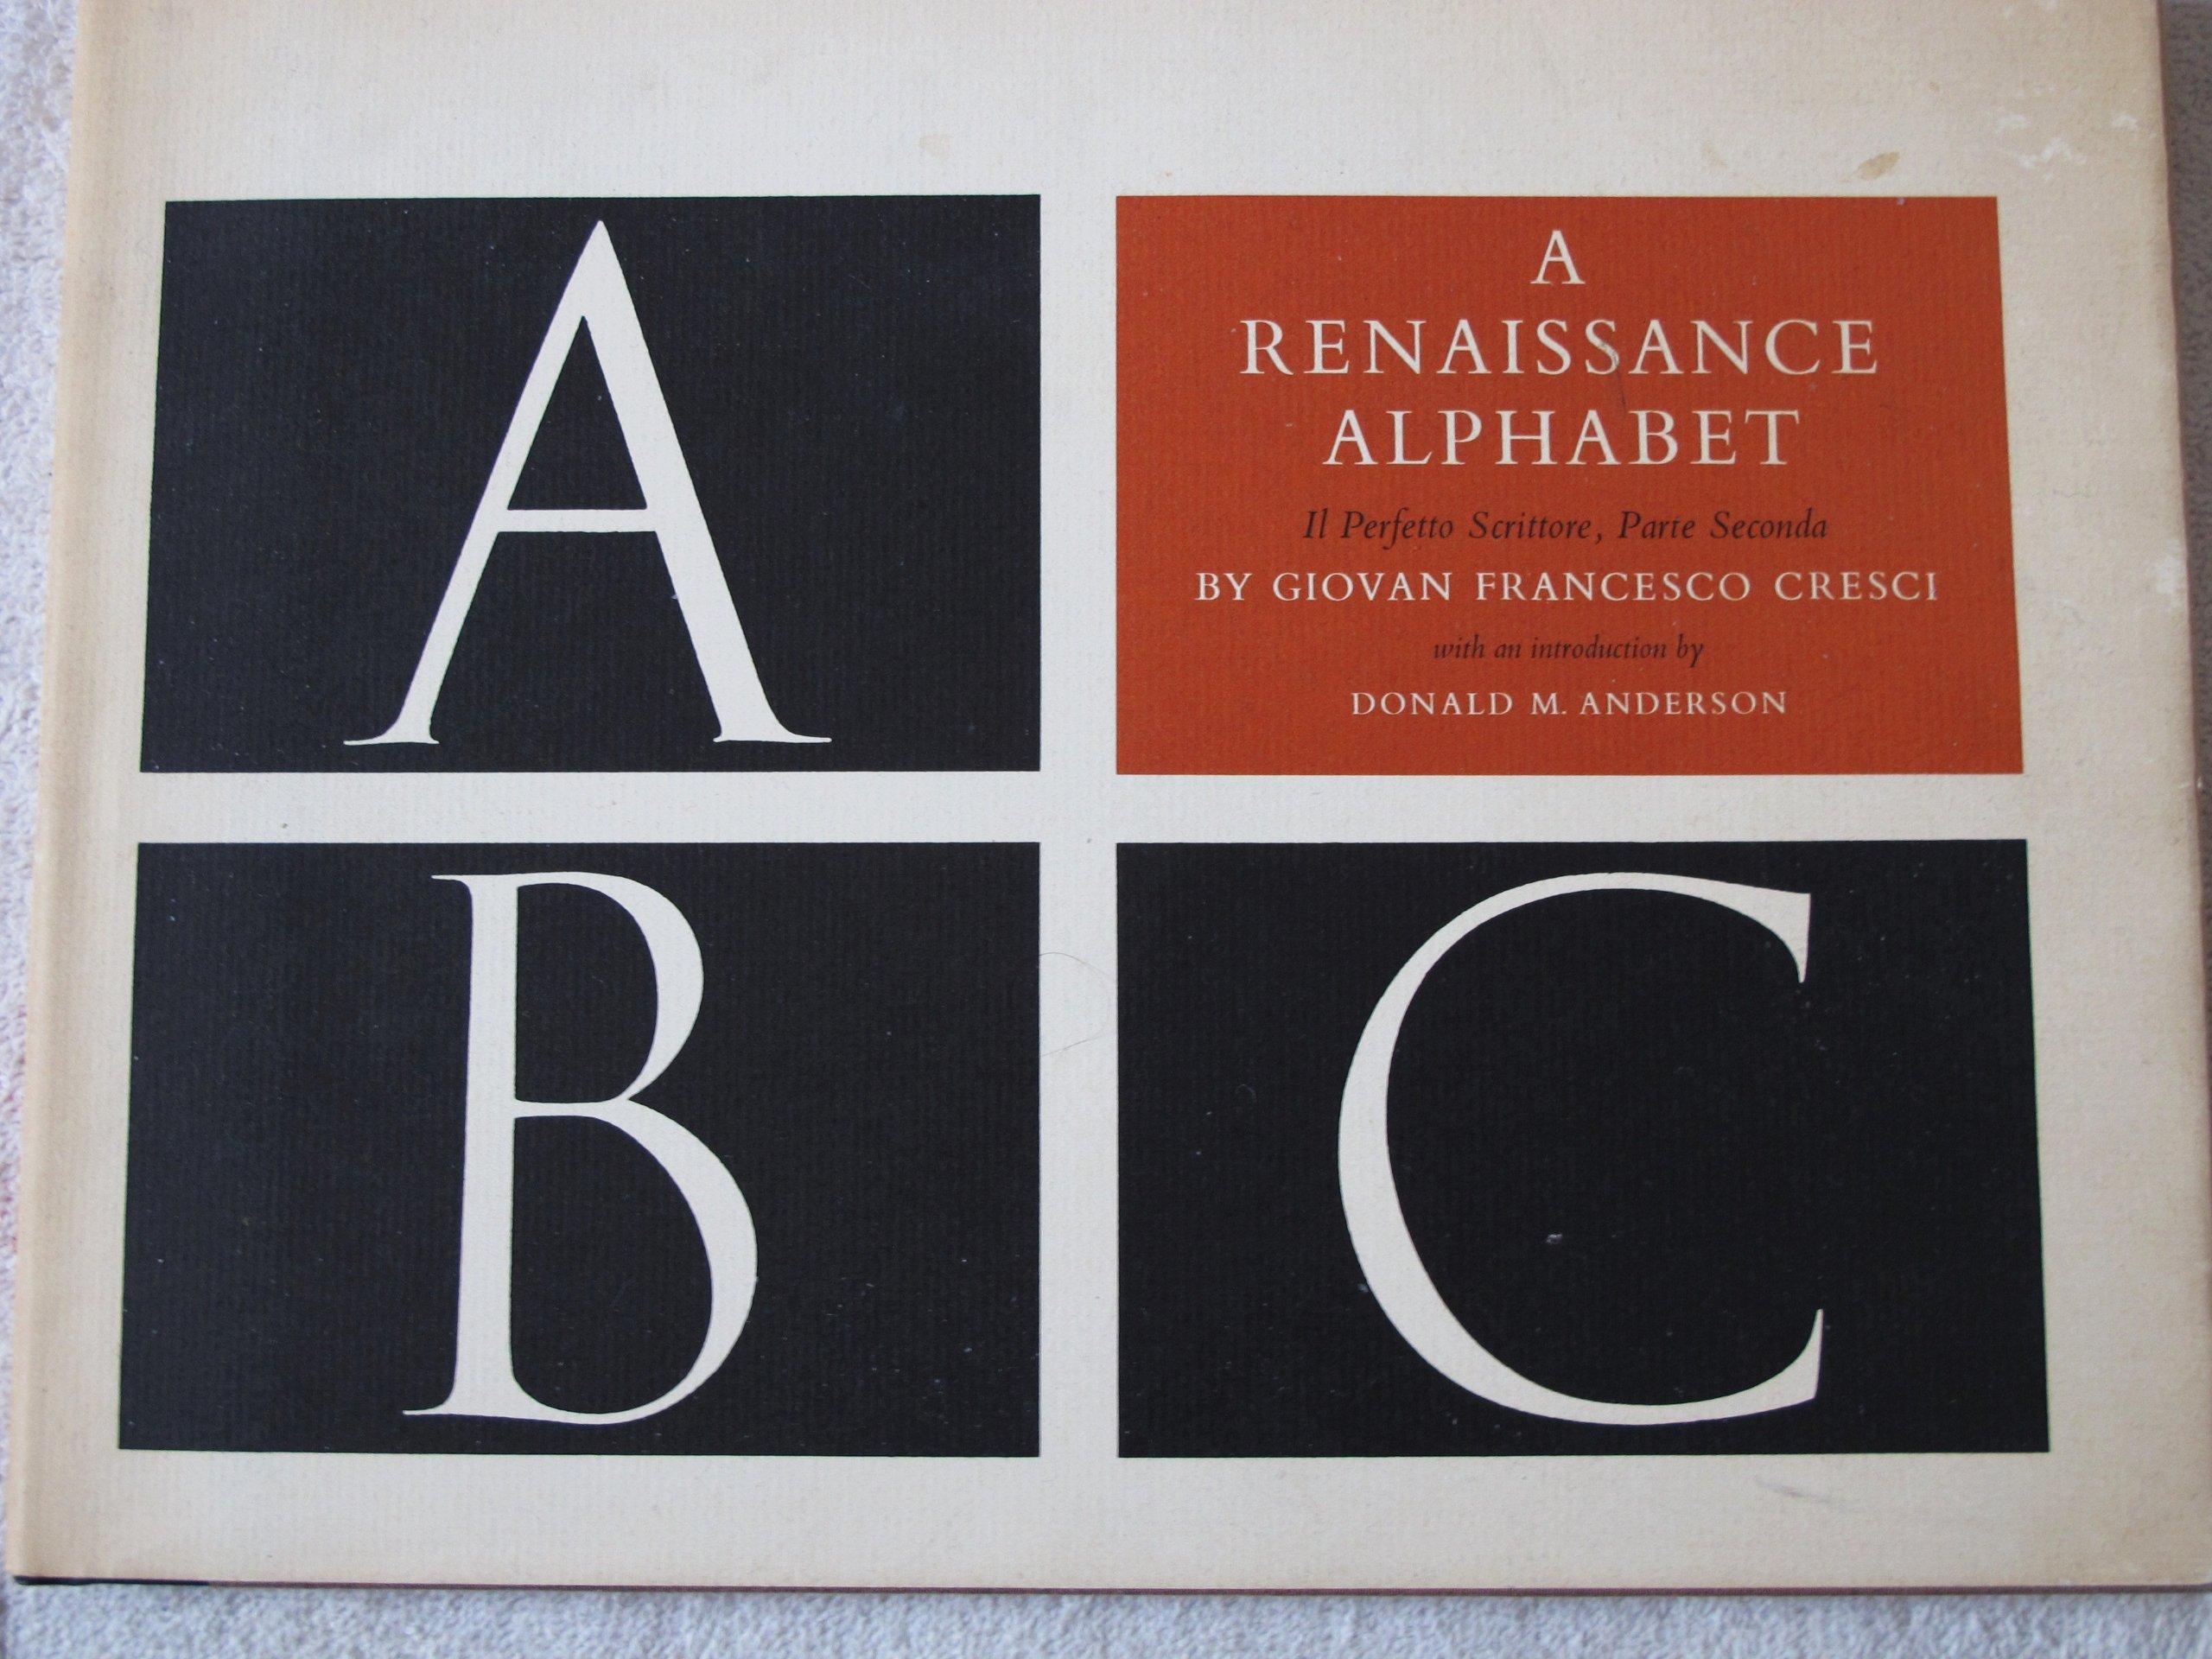 Renaissance Alphabet (Inglese) Copertina rigida – 1 nov 1971 Giovan F. Cresci Univ of Wisconsin Pr 0299057615 Design / Decorative Arts